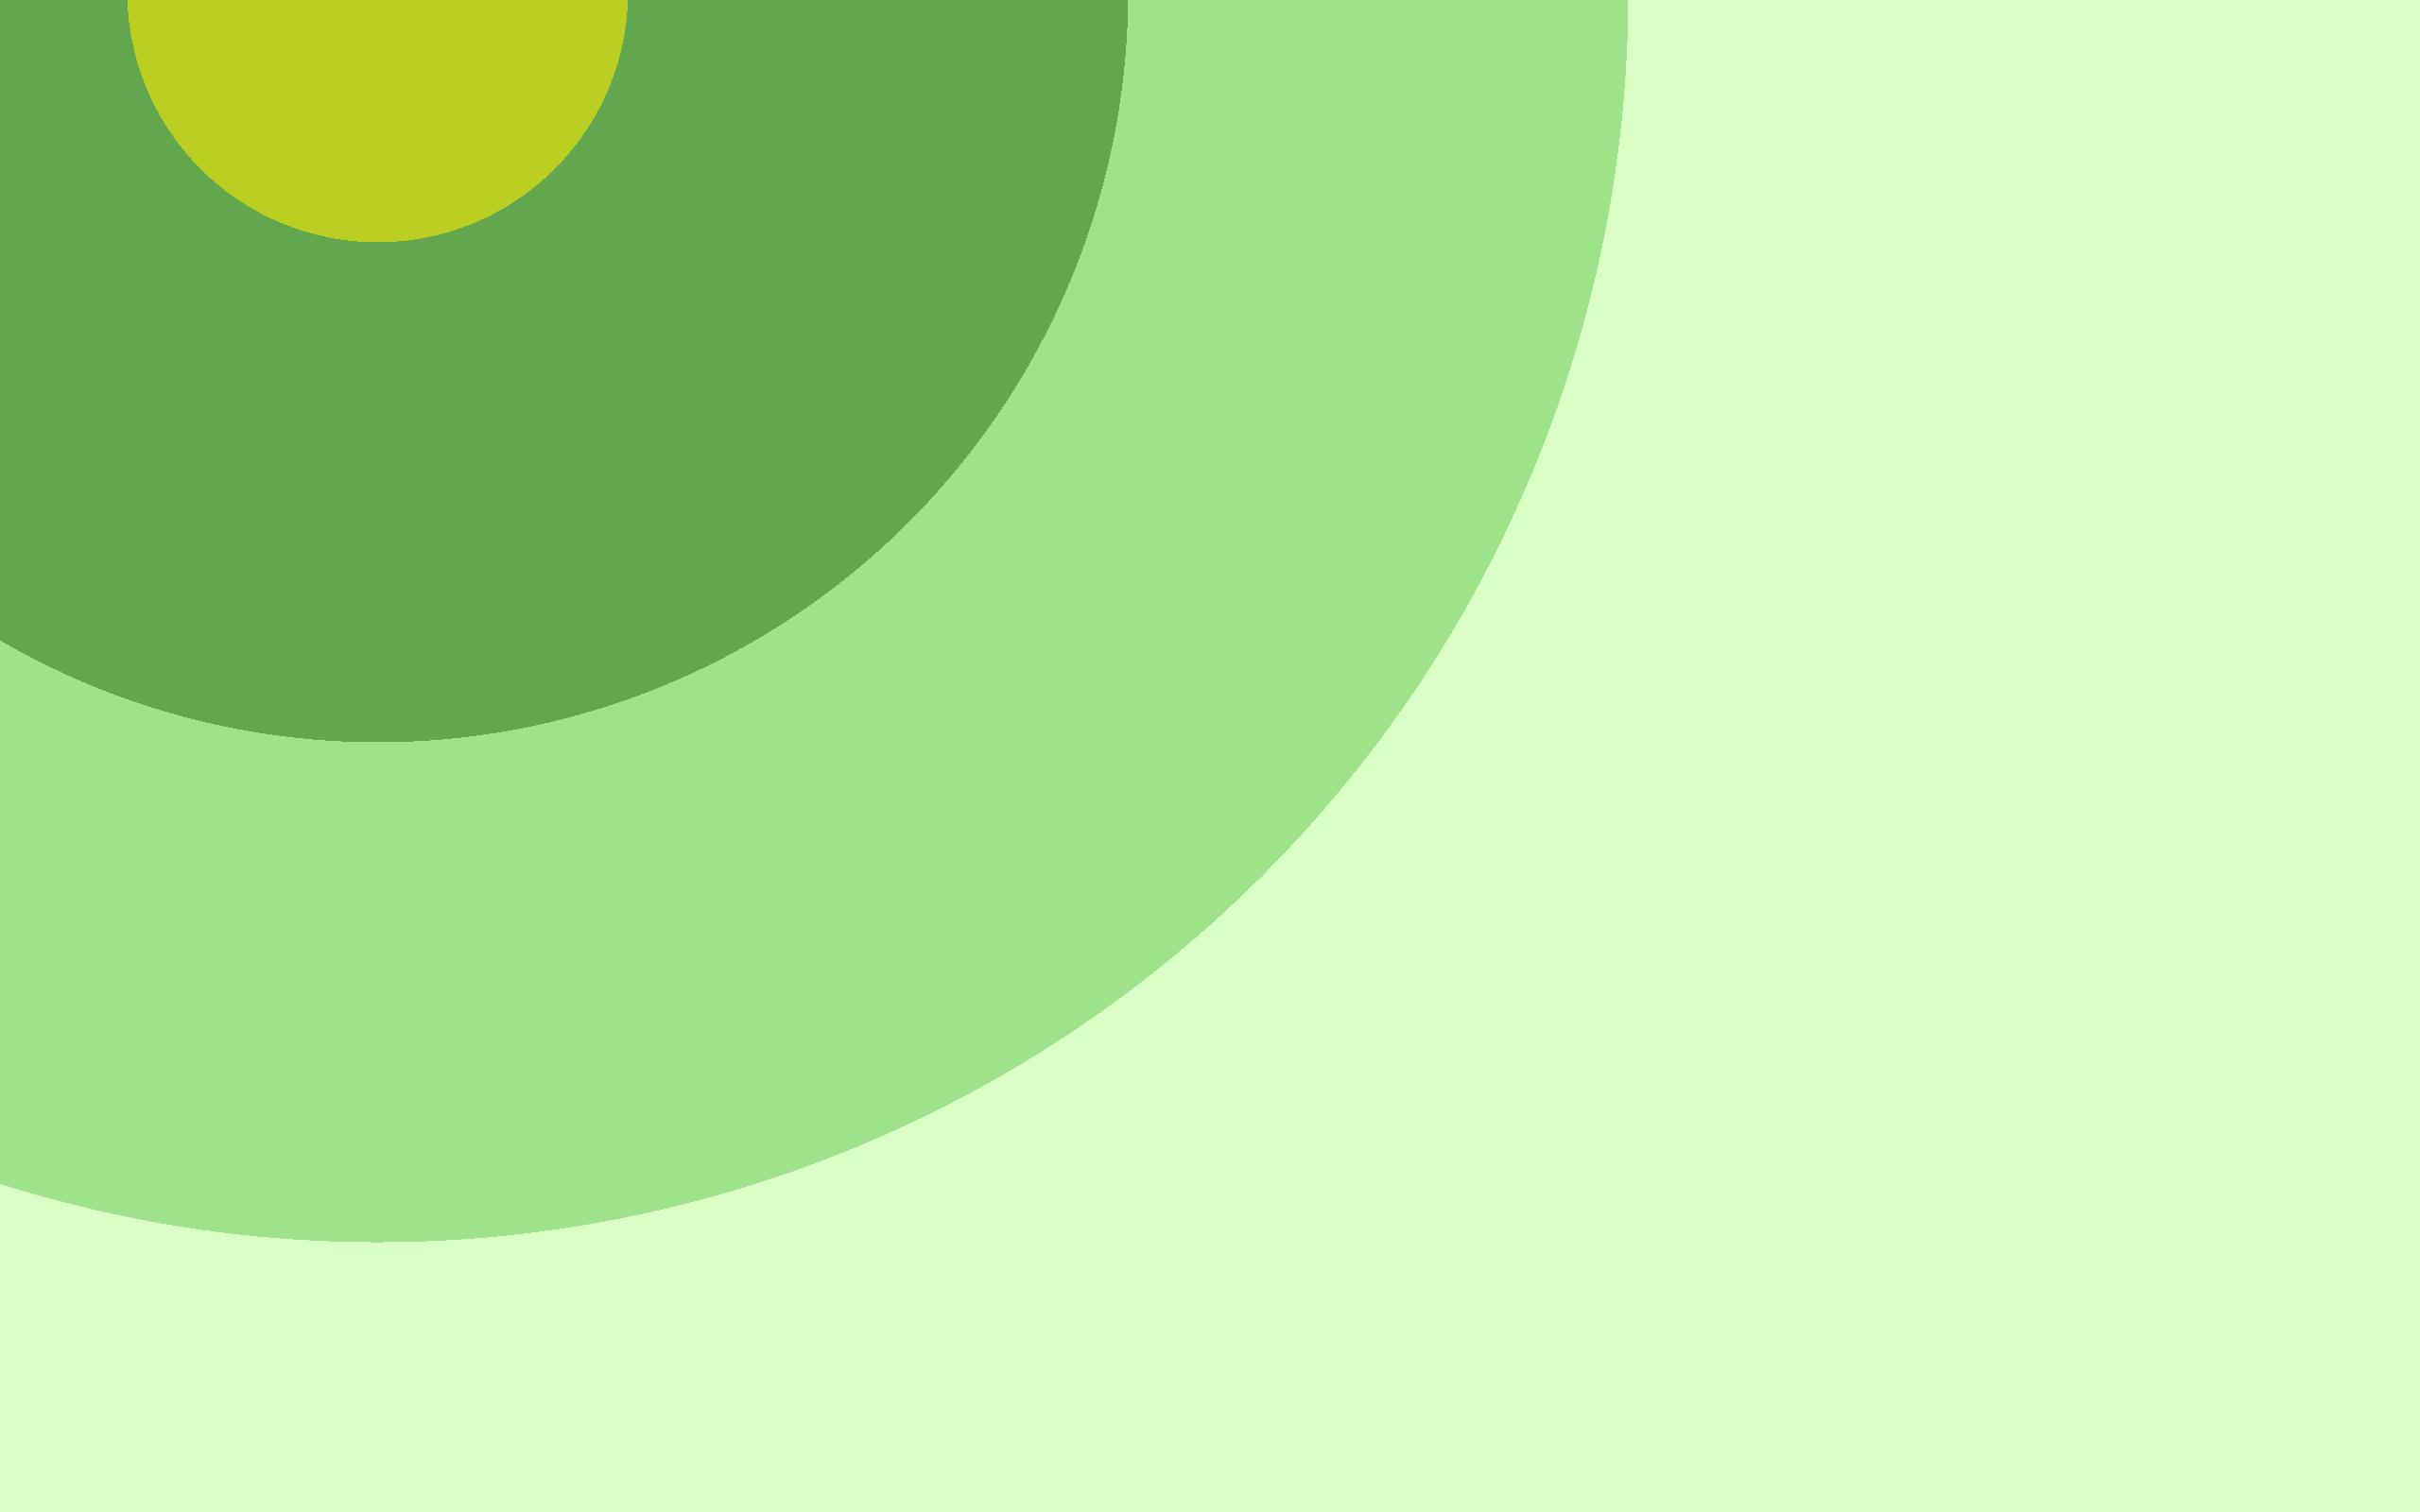 assets/images/bg/tango-circle-bg-green.png